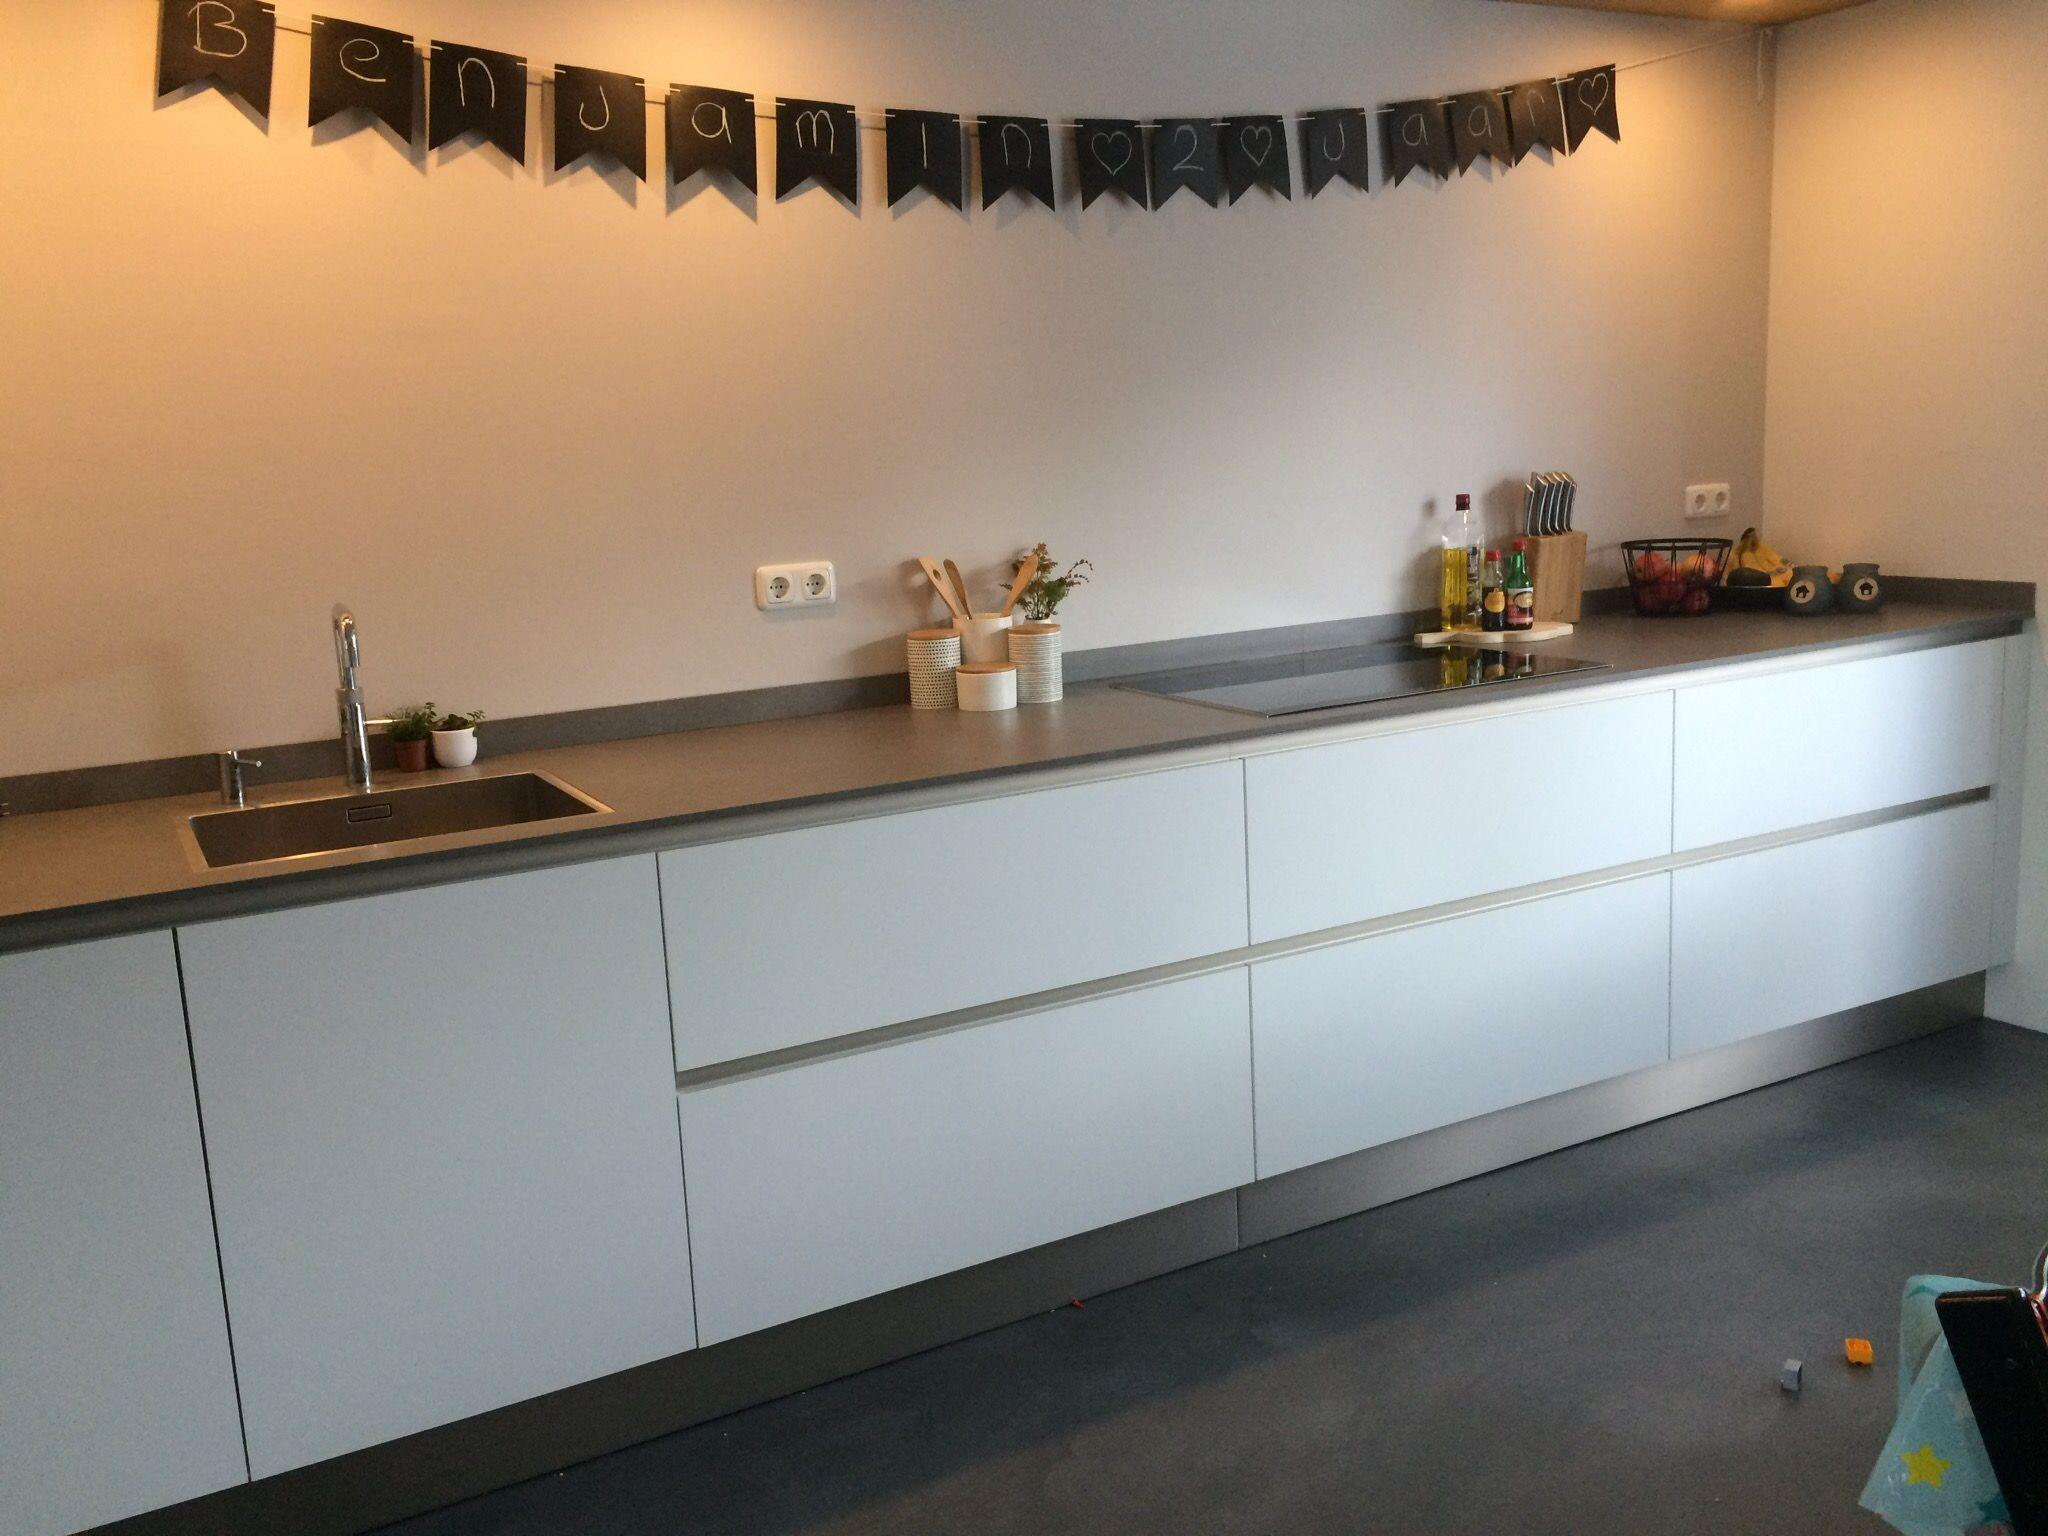 witte keuken moderne keuken strakke keuken dun aanrechtblad